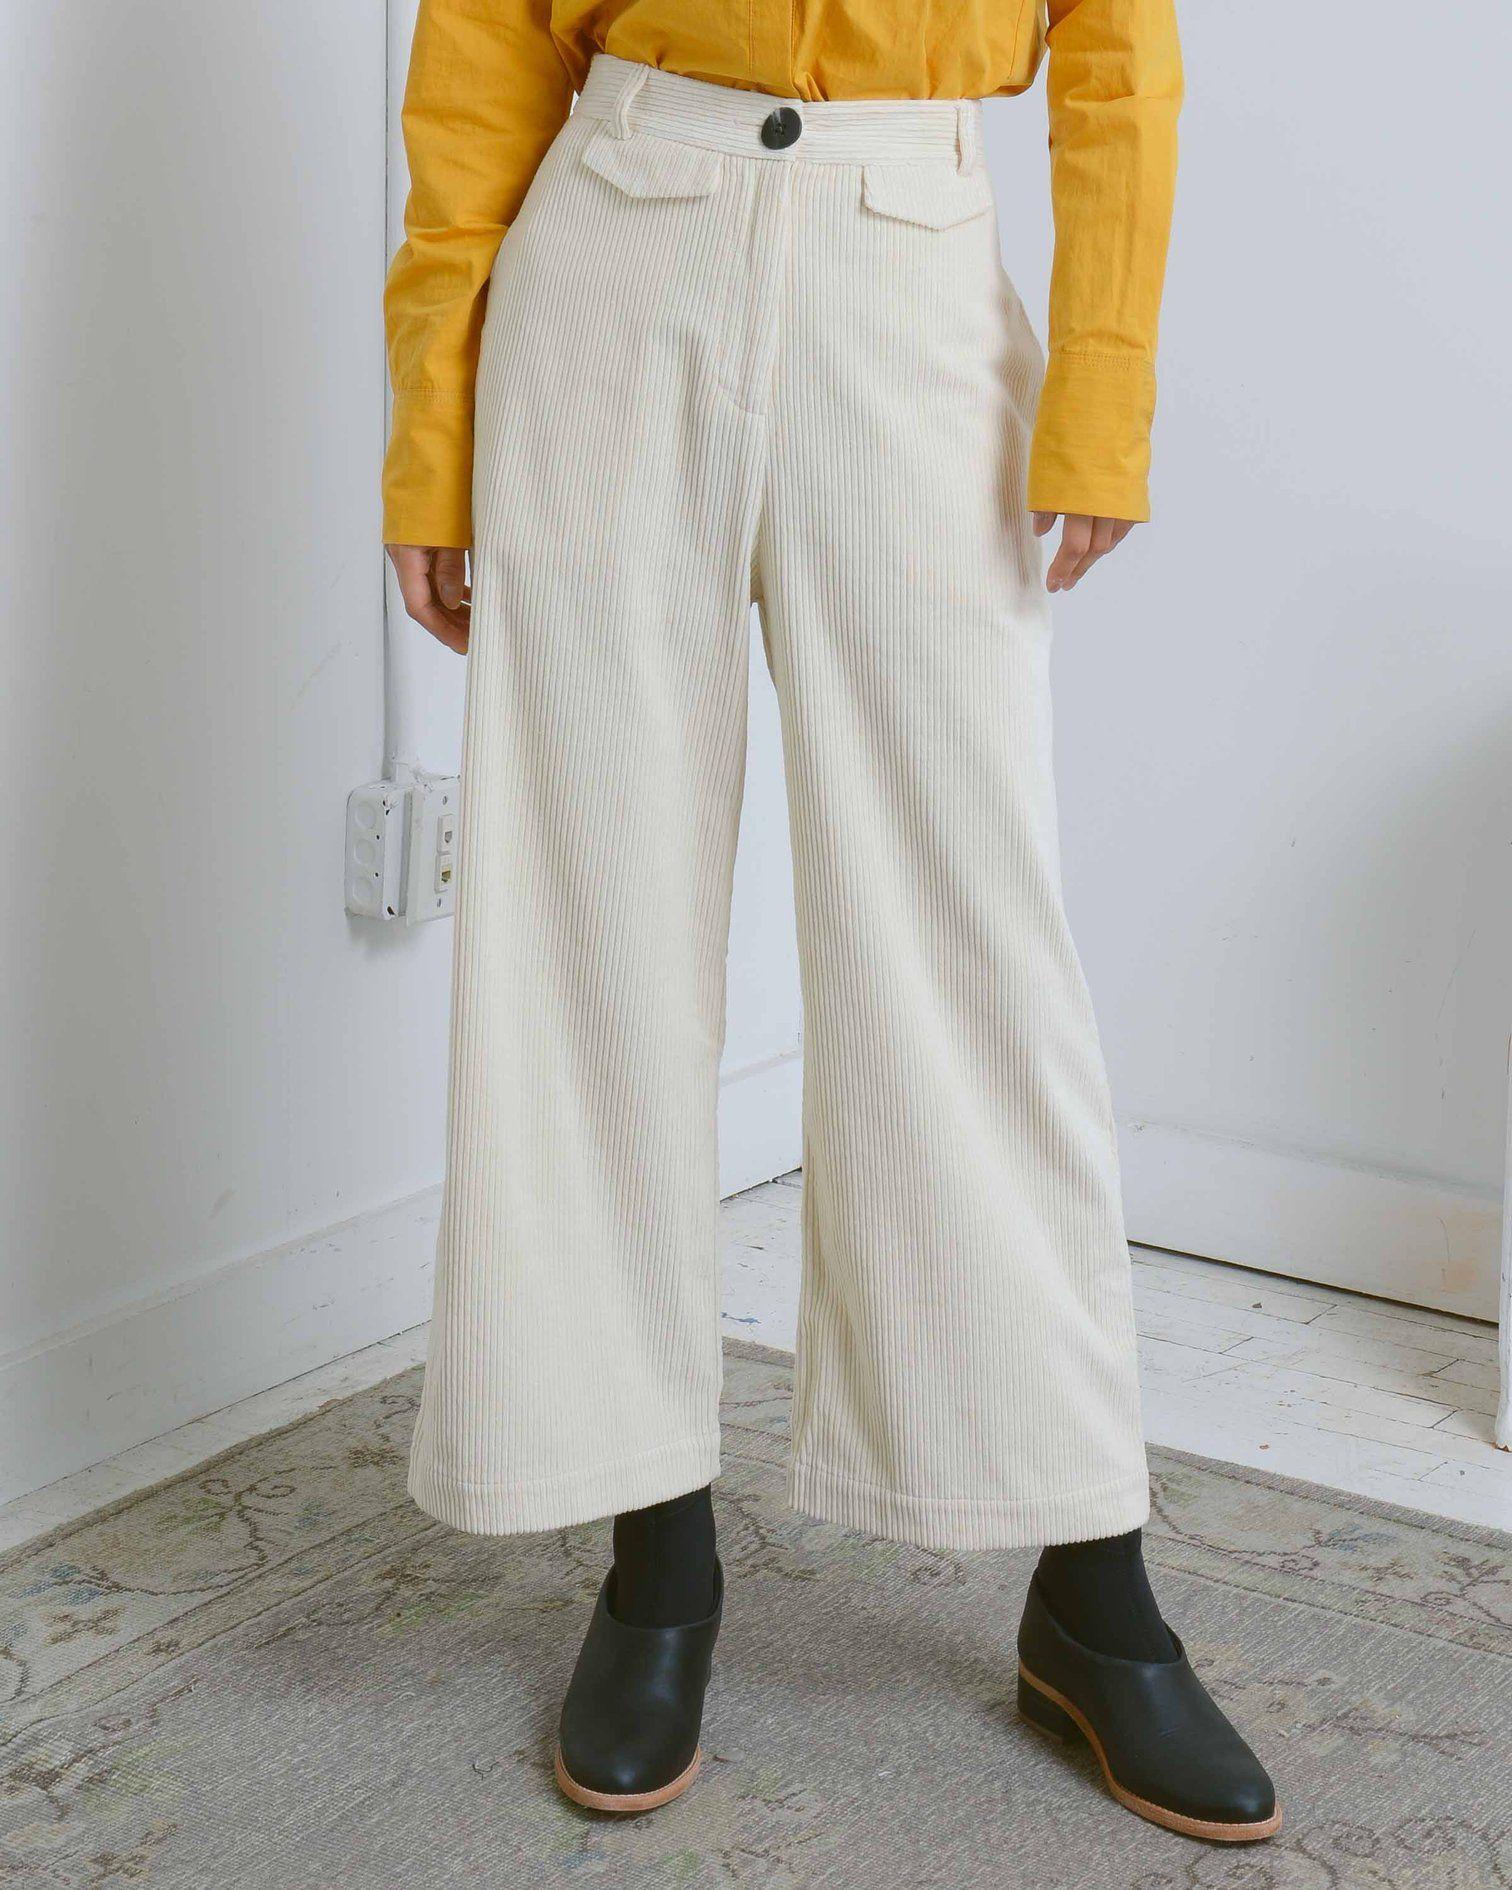 49cd14645fa510 Cream Wide Leg Corduroy Pants | ANTHOM // Pants + Shorts | Corduroy ...